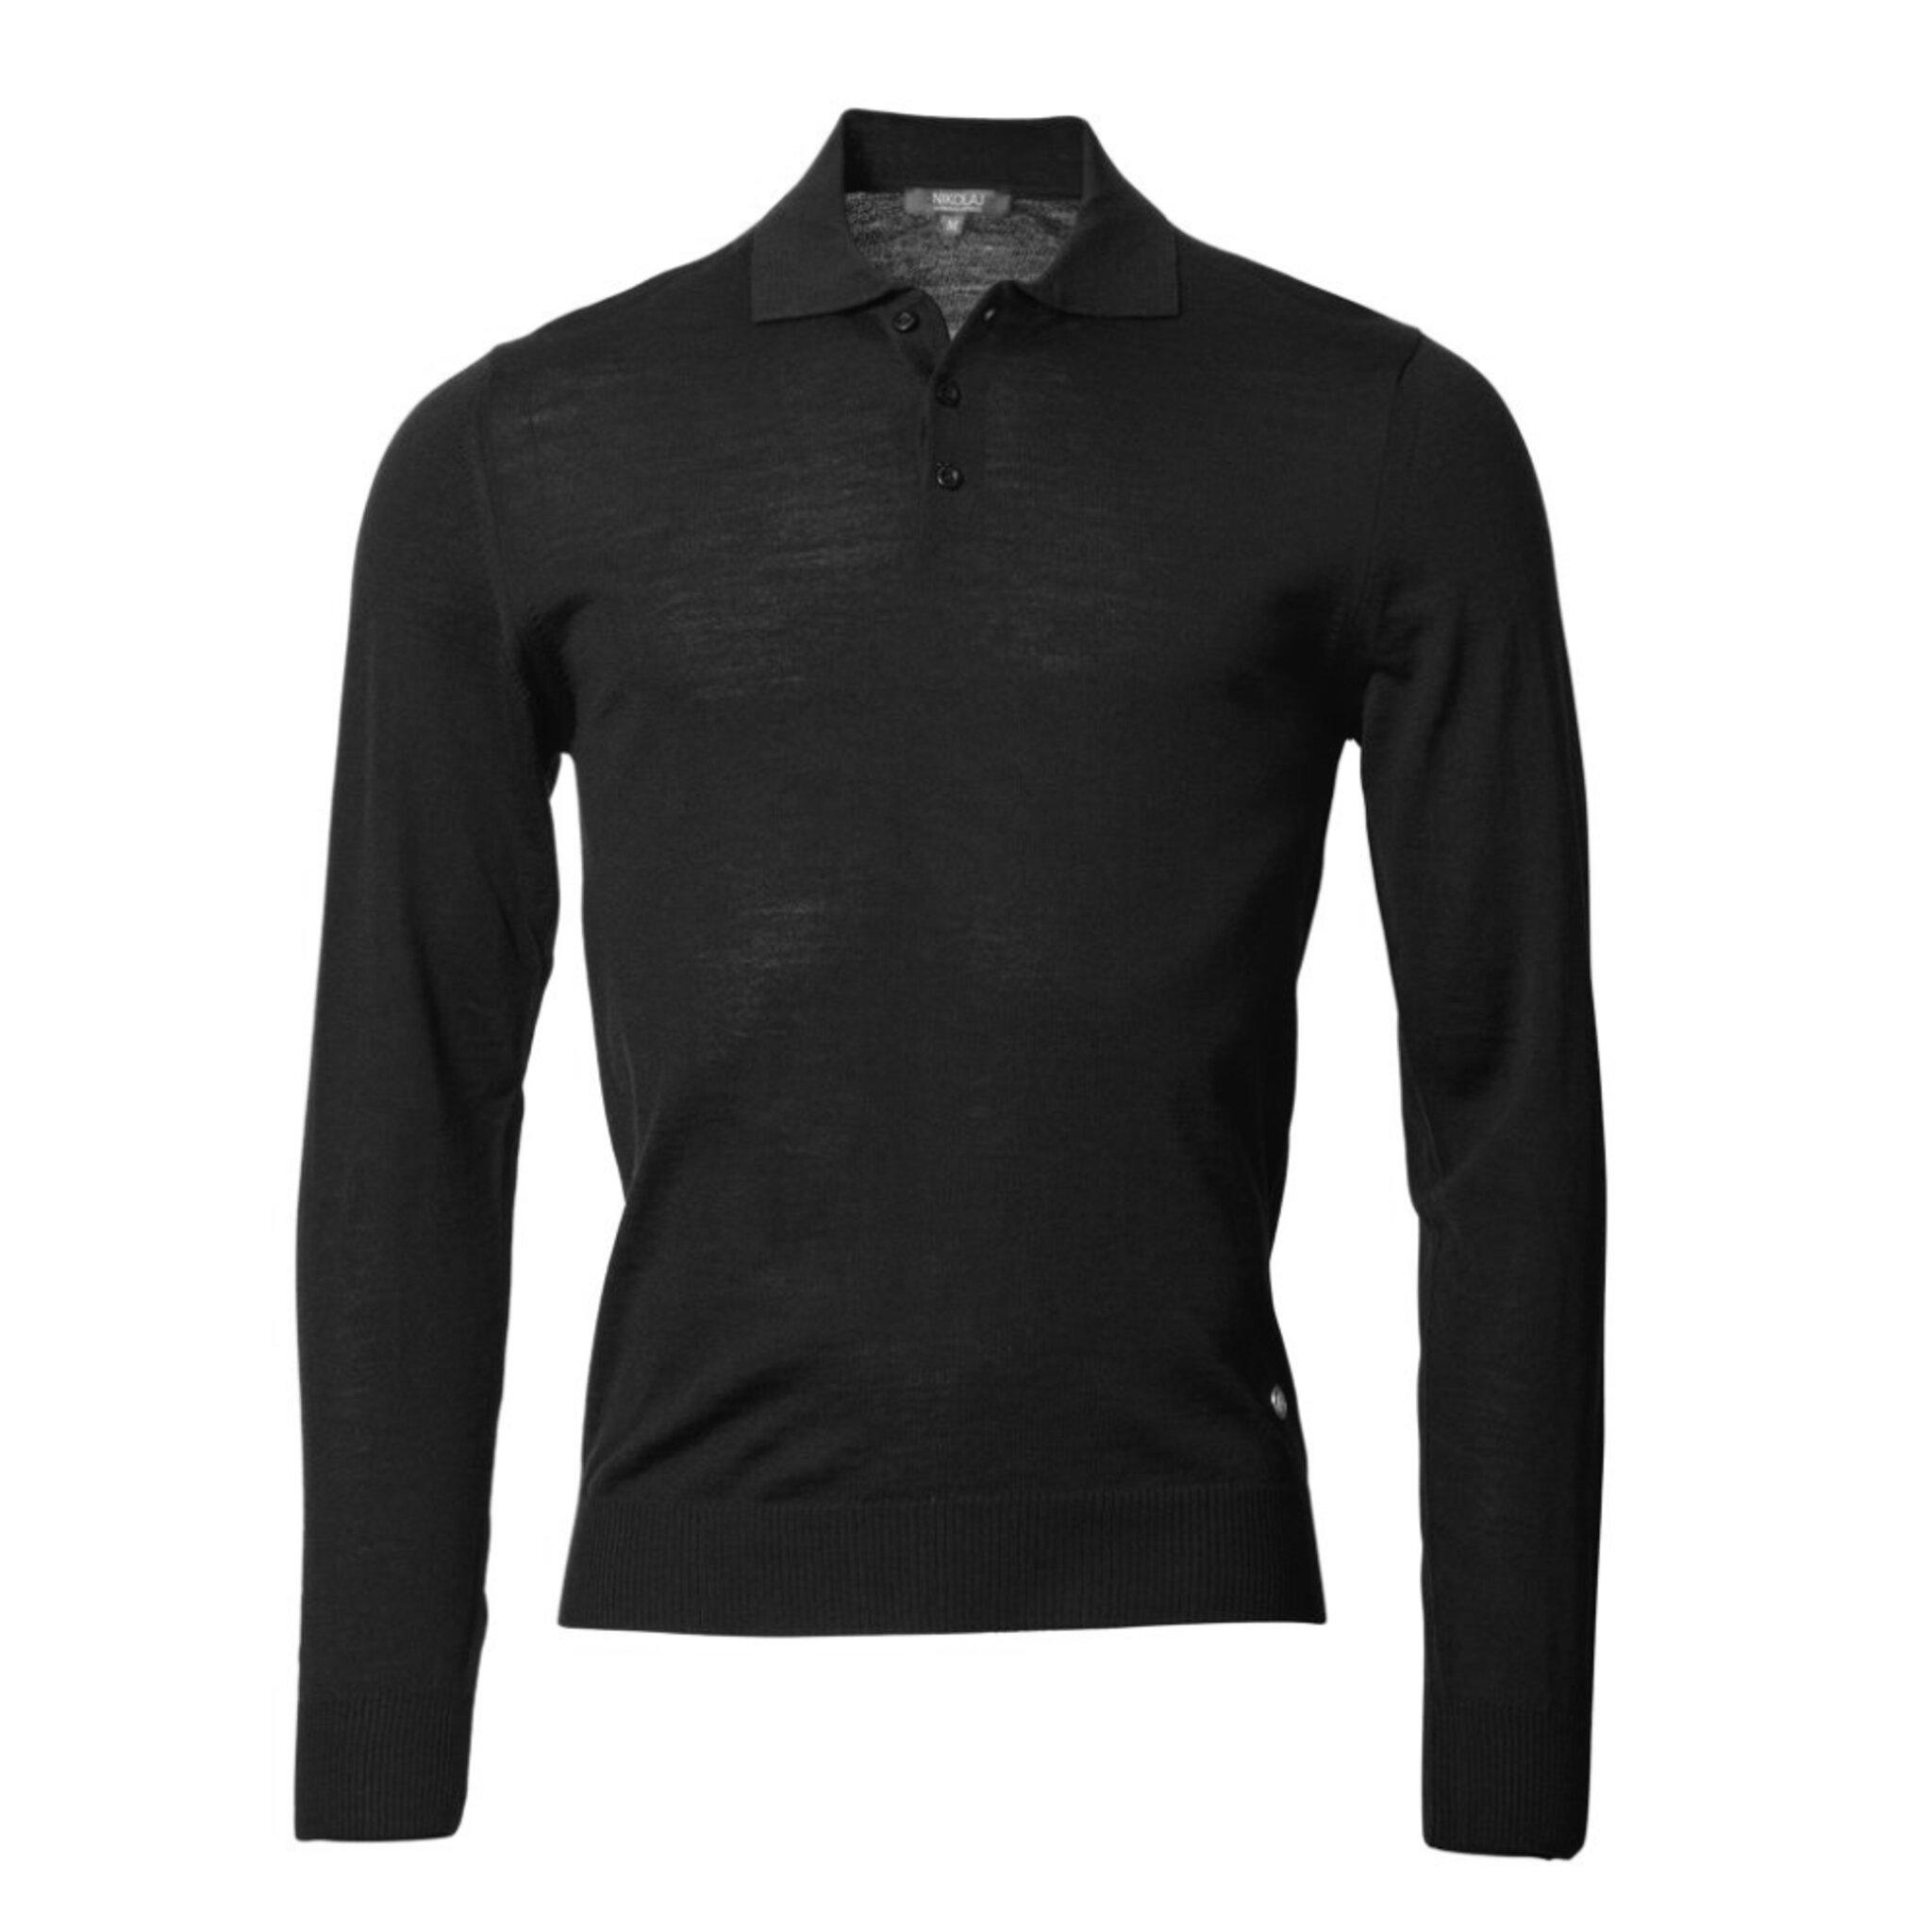 Felix Long Sleeve Knitted Polo Shirt